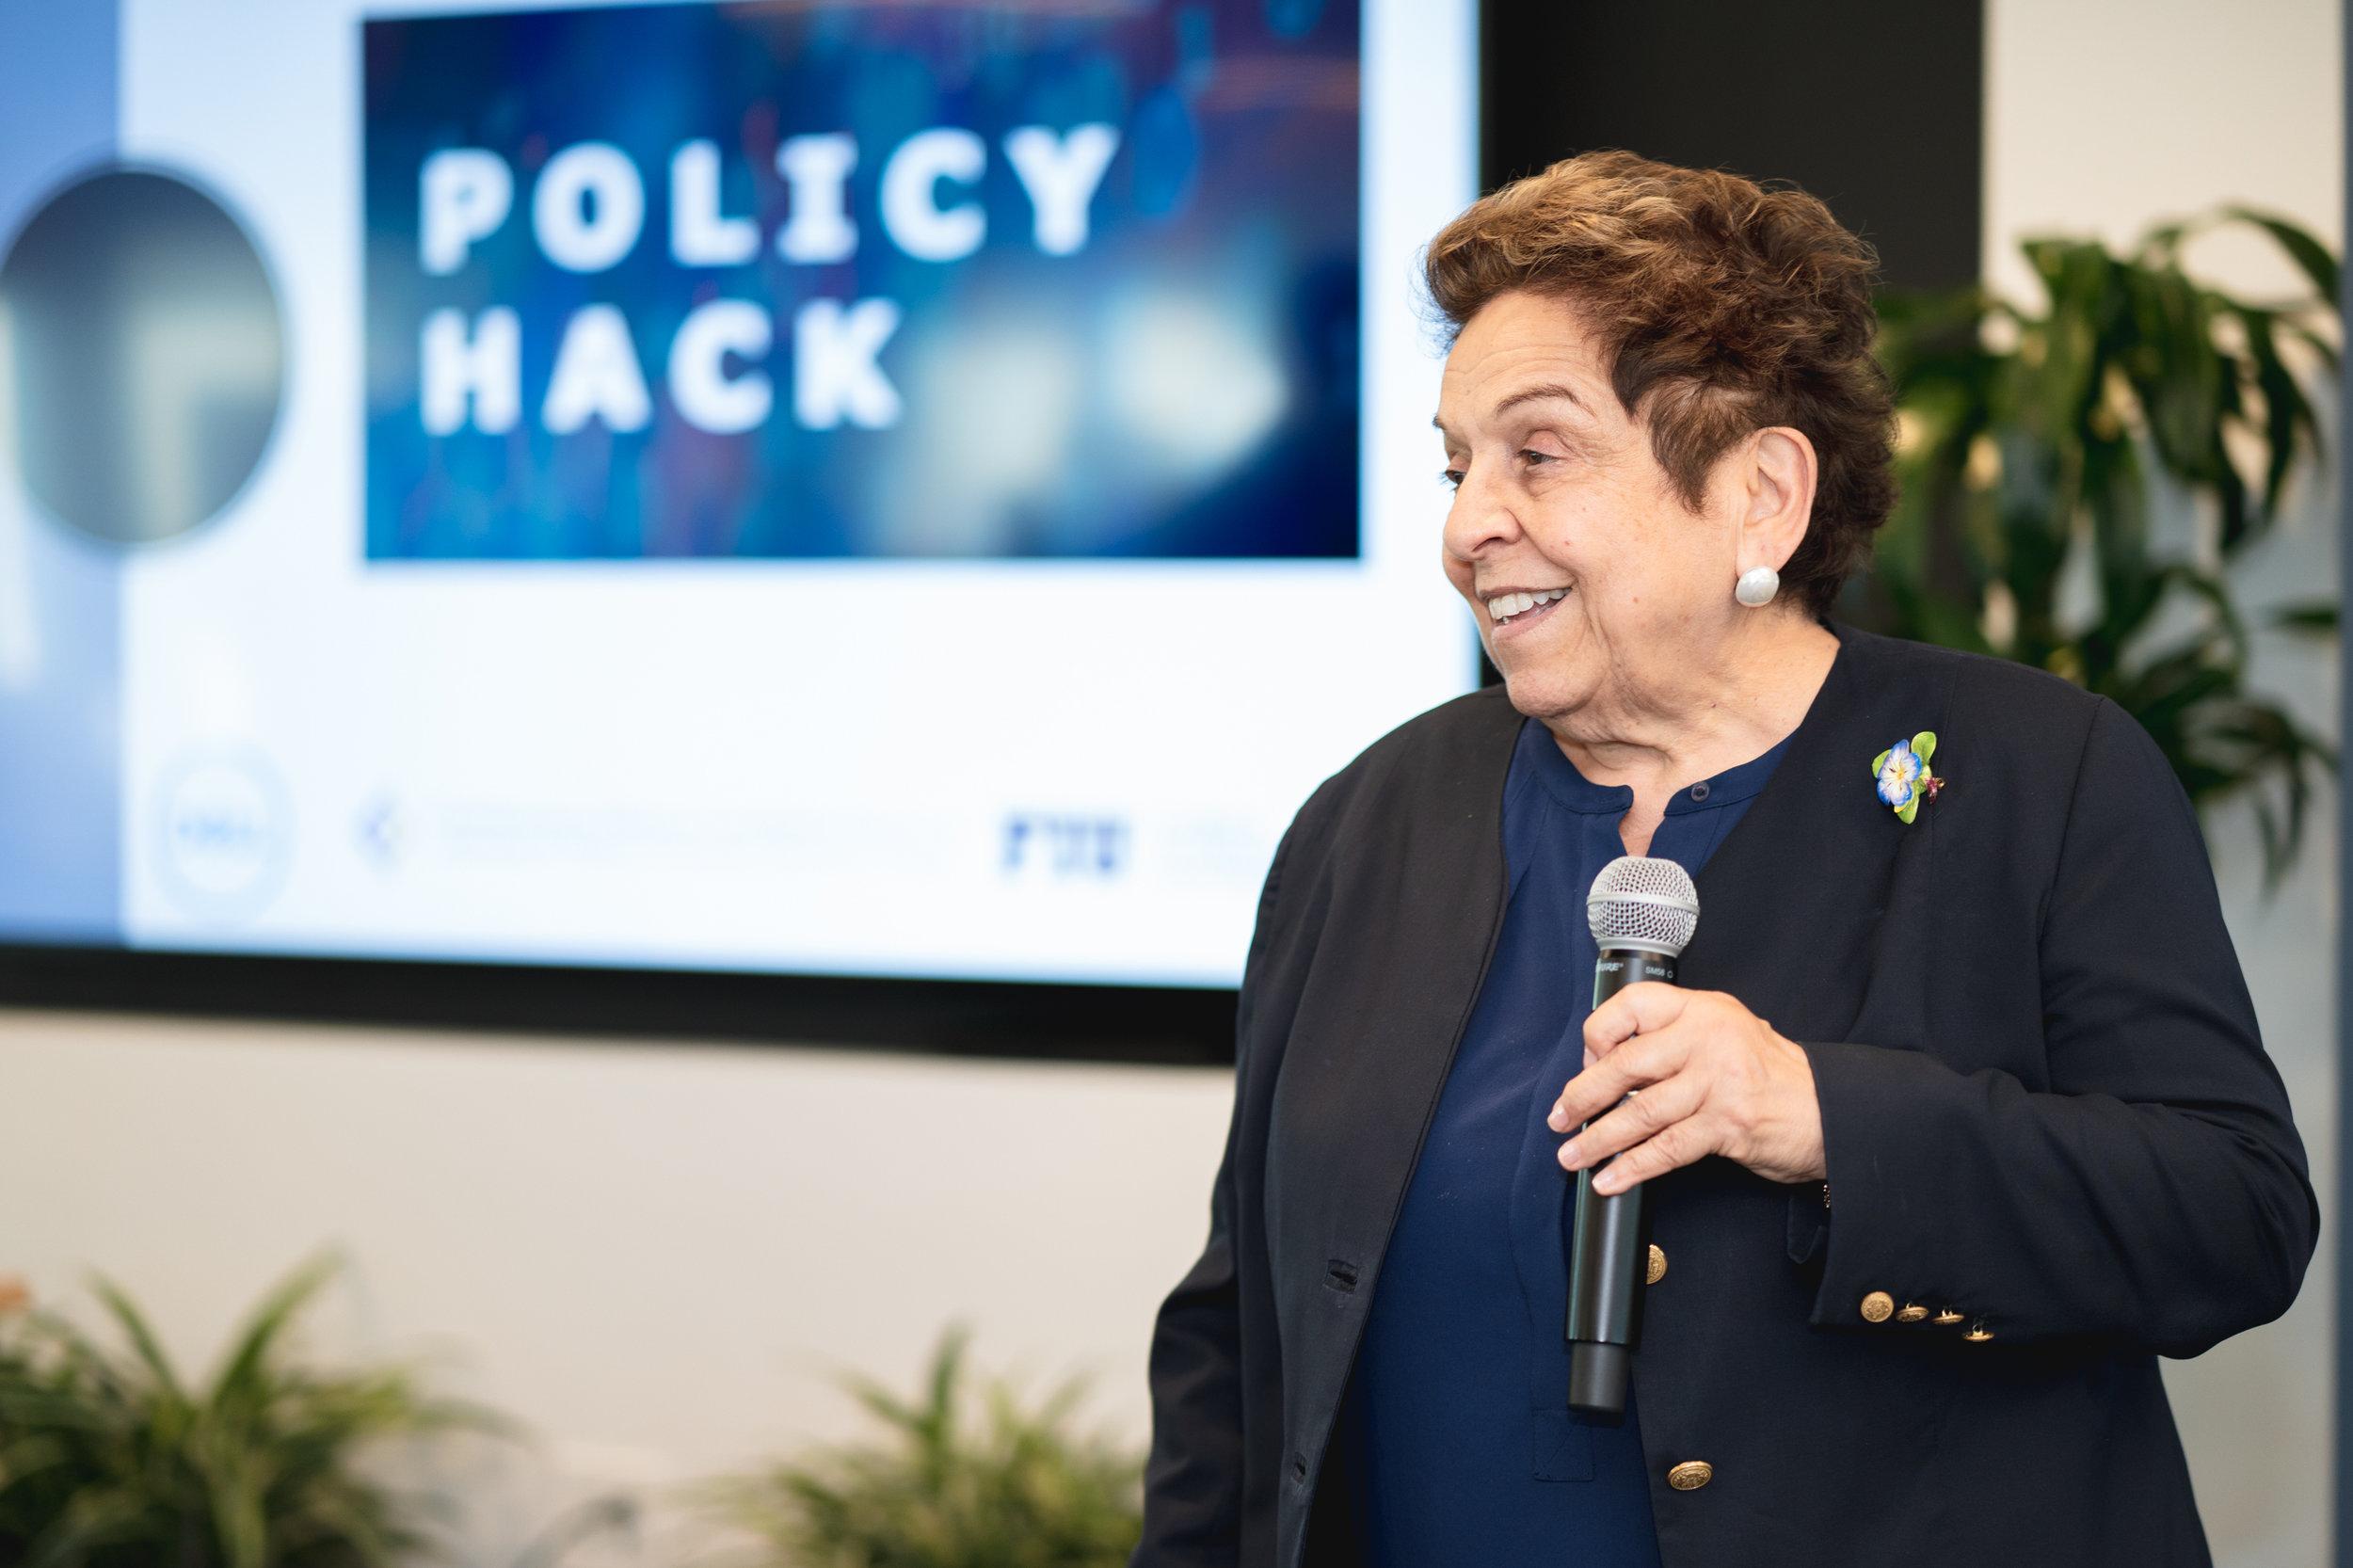 Policy Hack-83.jpg